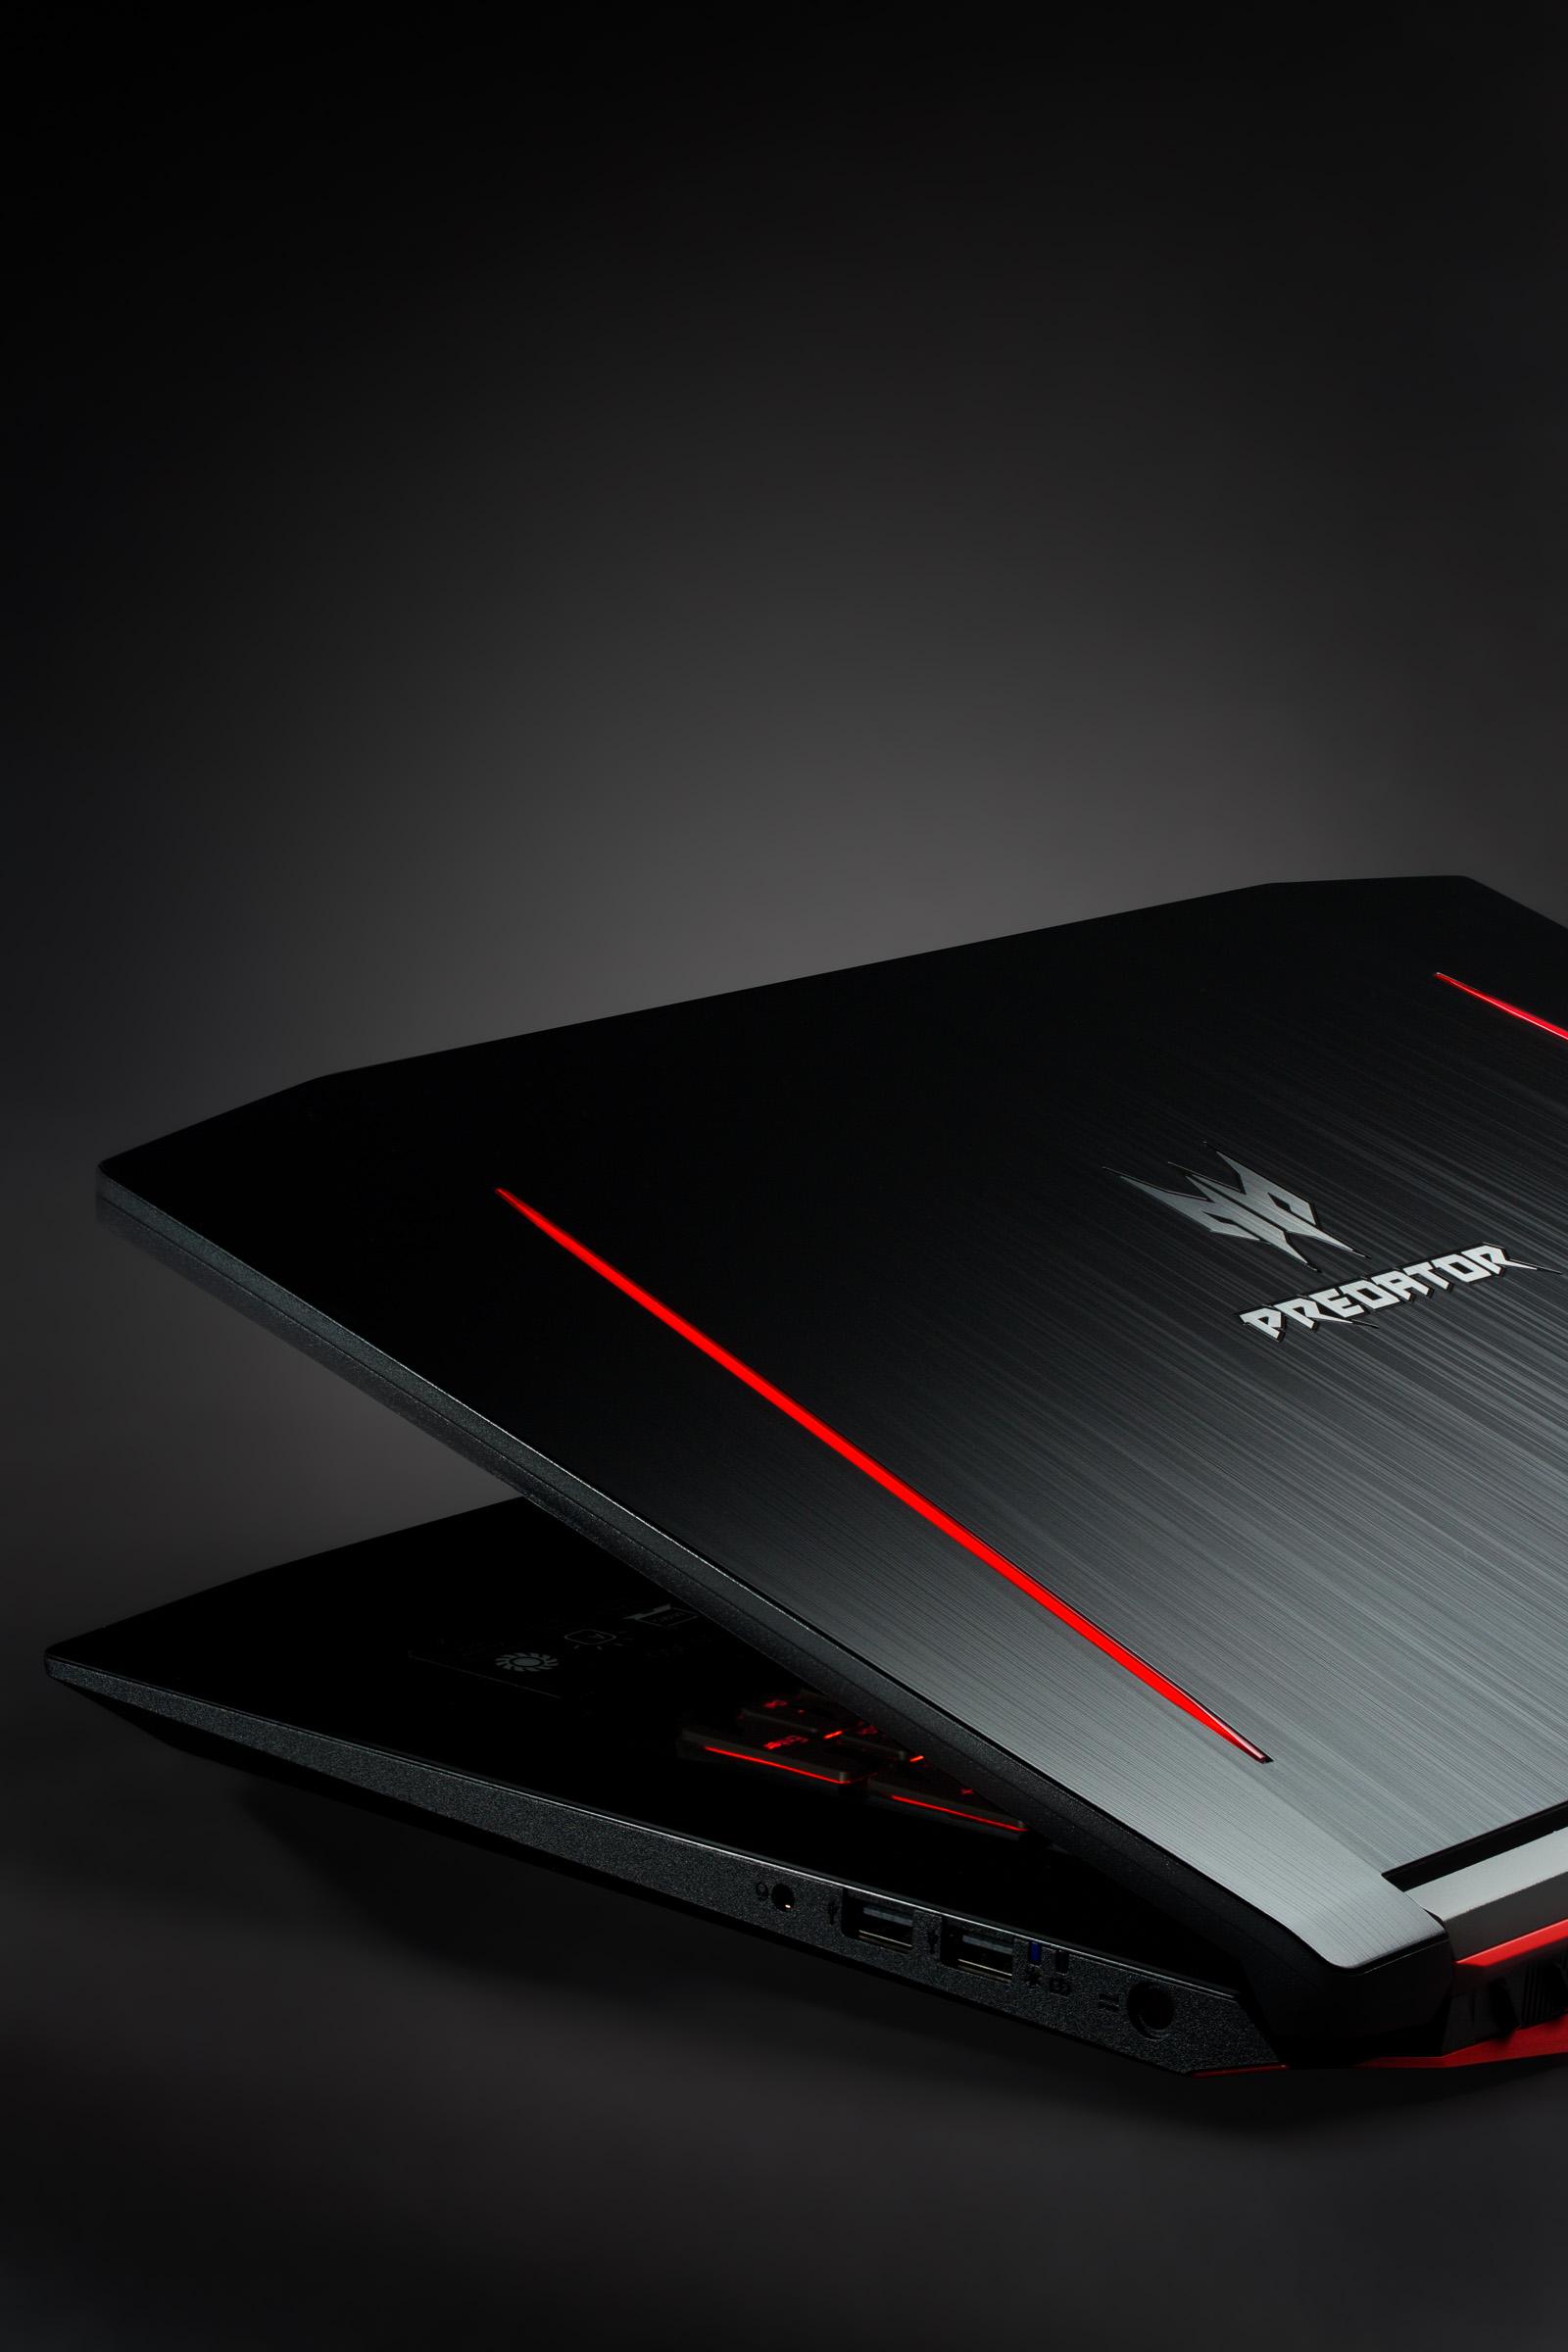 Acer-photographie produit montreal